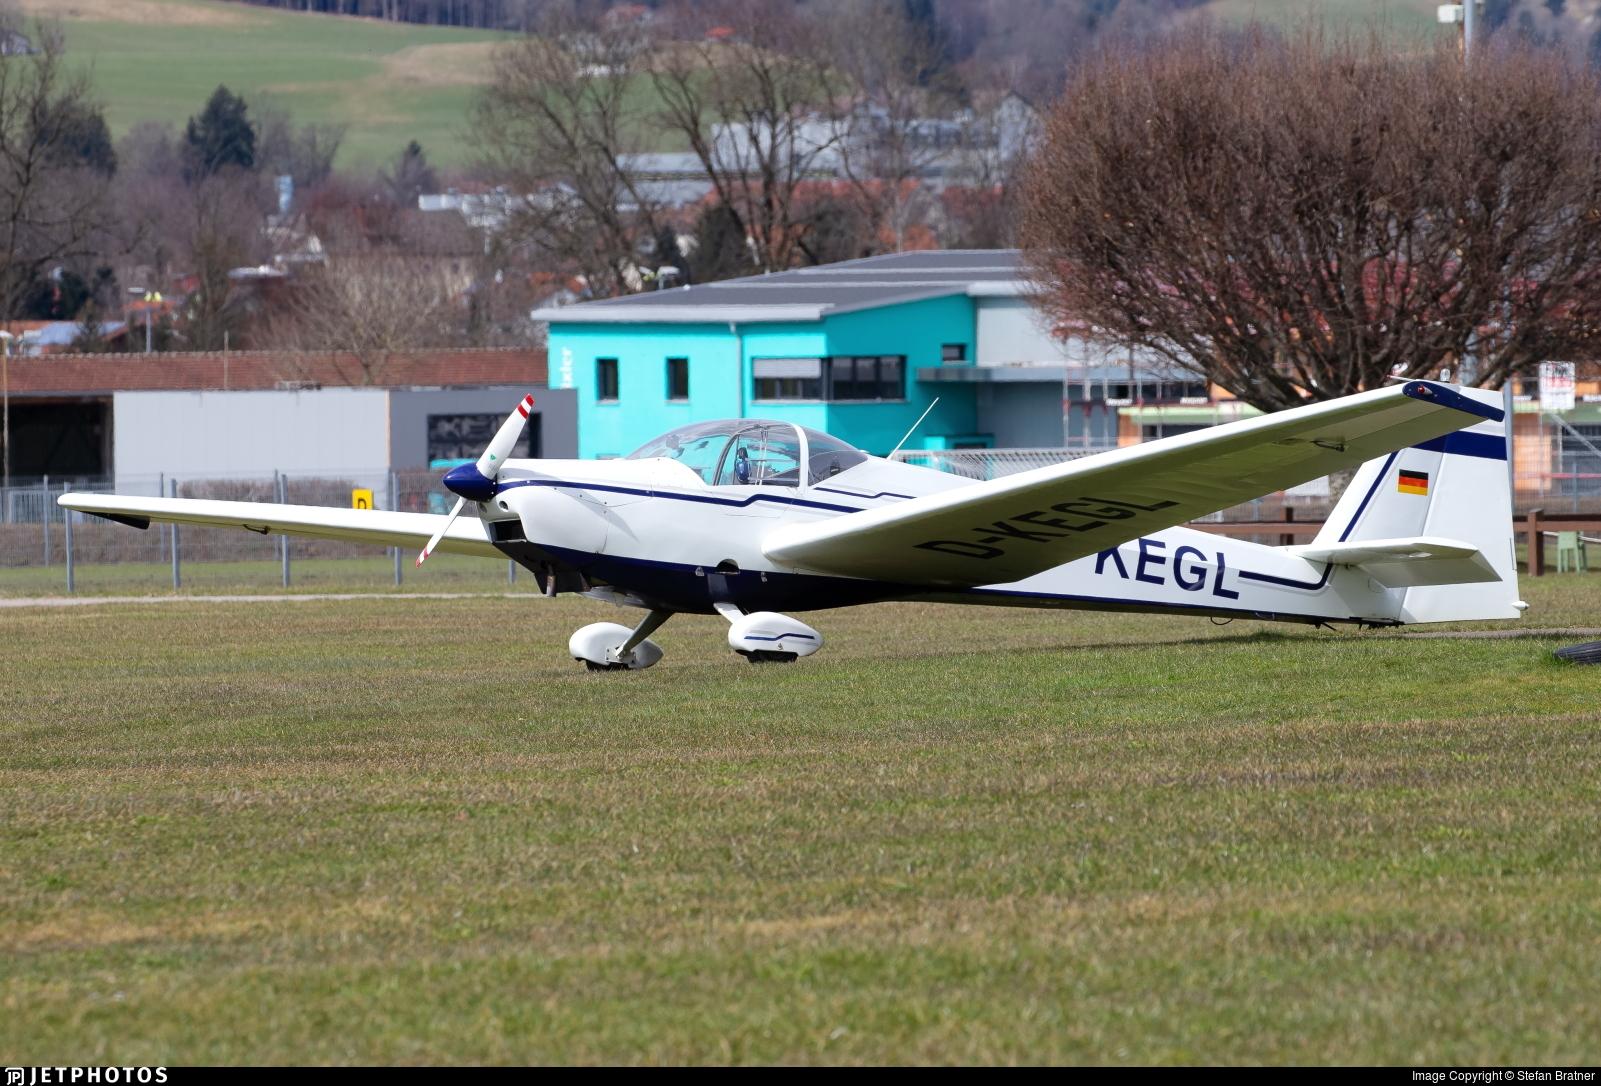 D-KEGL - Scheibe SF.25C Falke - Flugschule Michael Bergmann